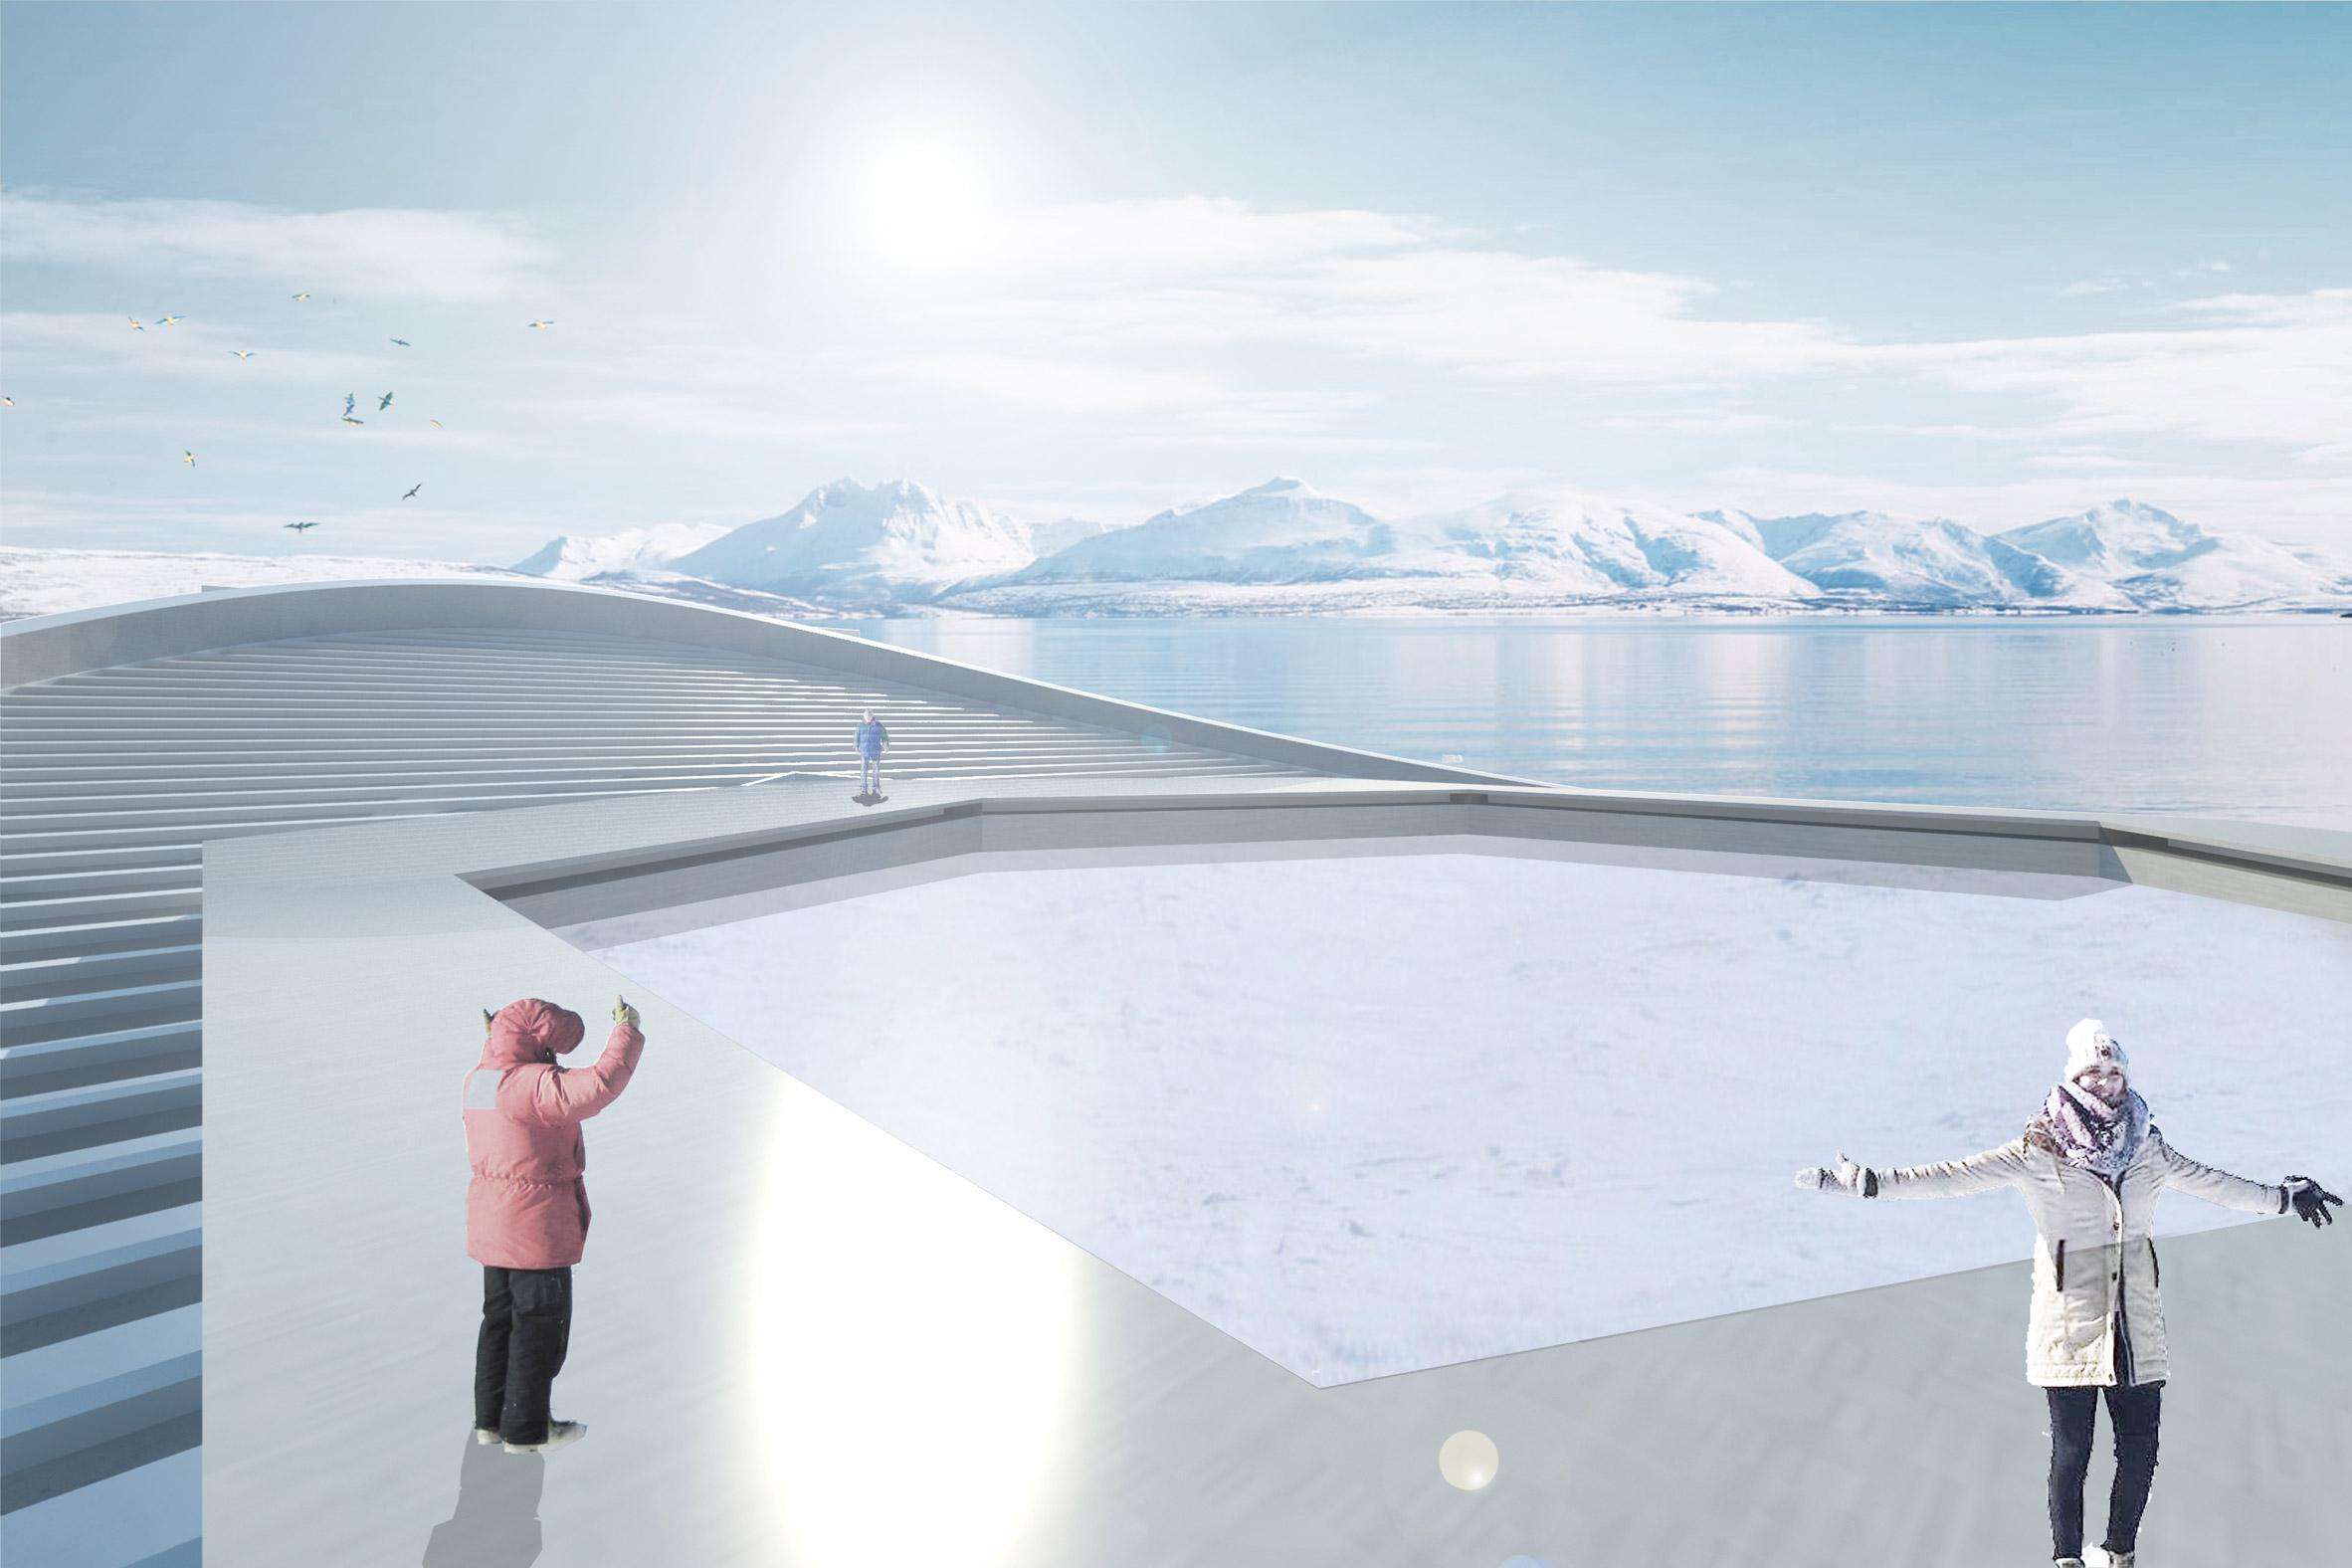 refreeze-the-arctic-faris-kota-design-technology-climate-change_dezeen_2364_col_3